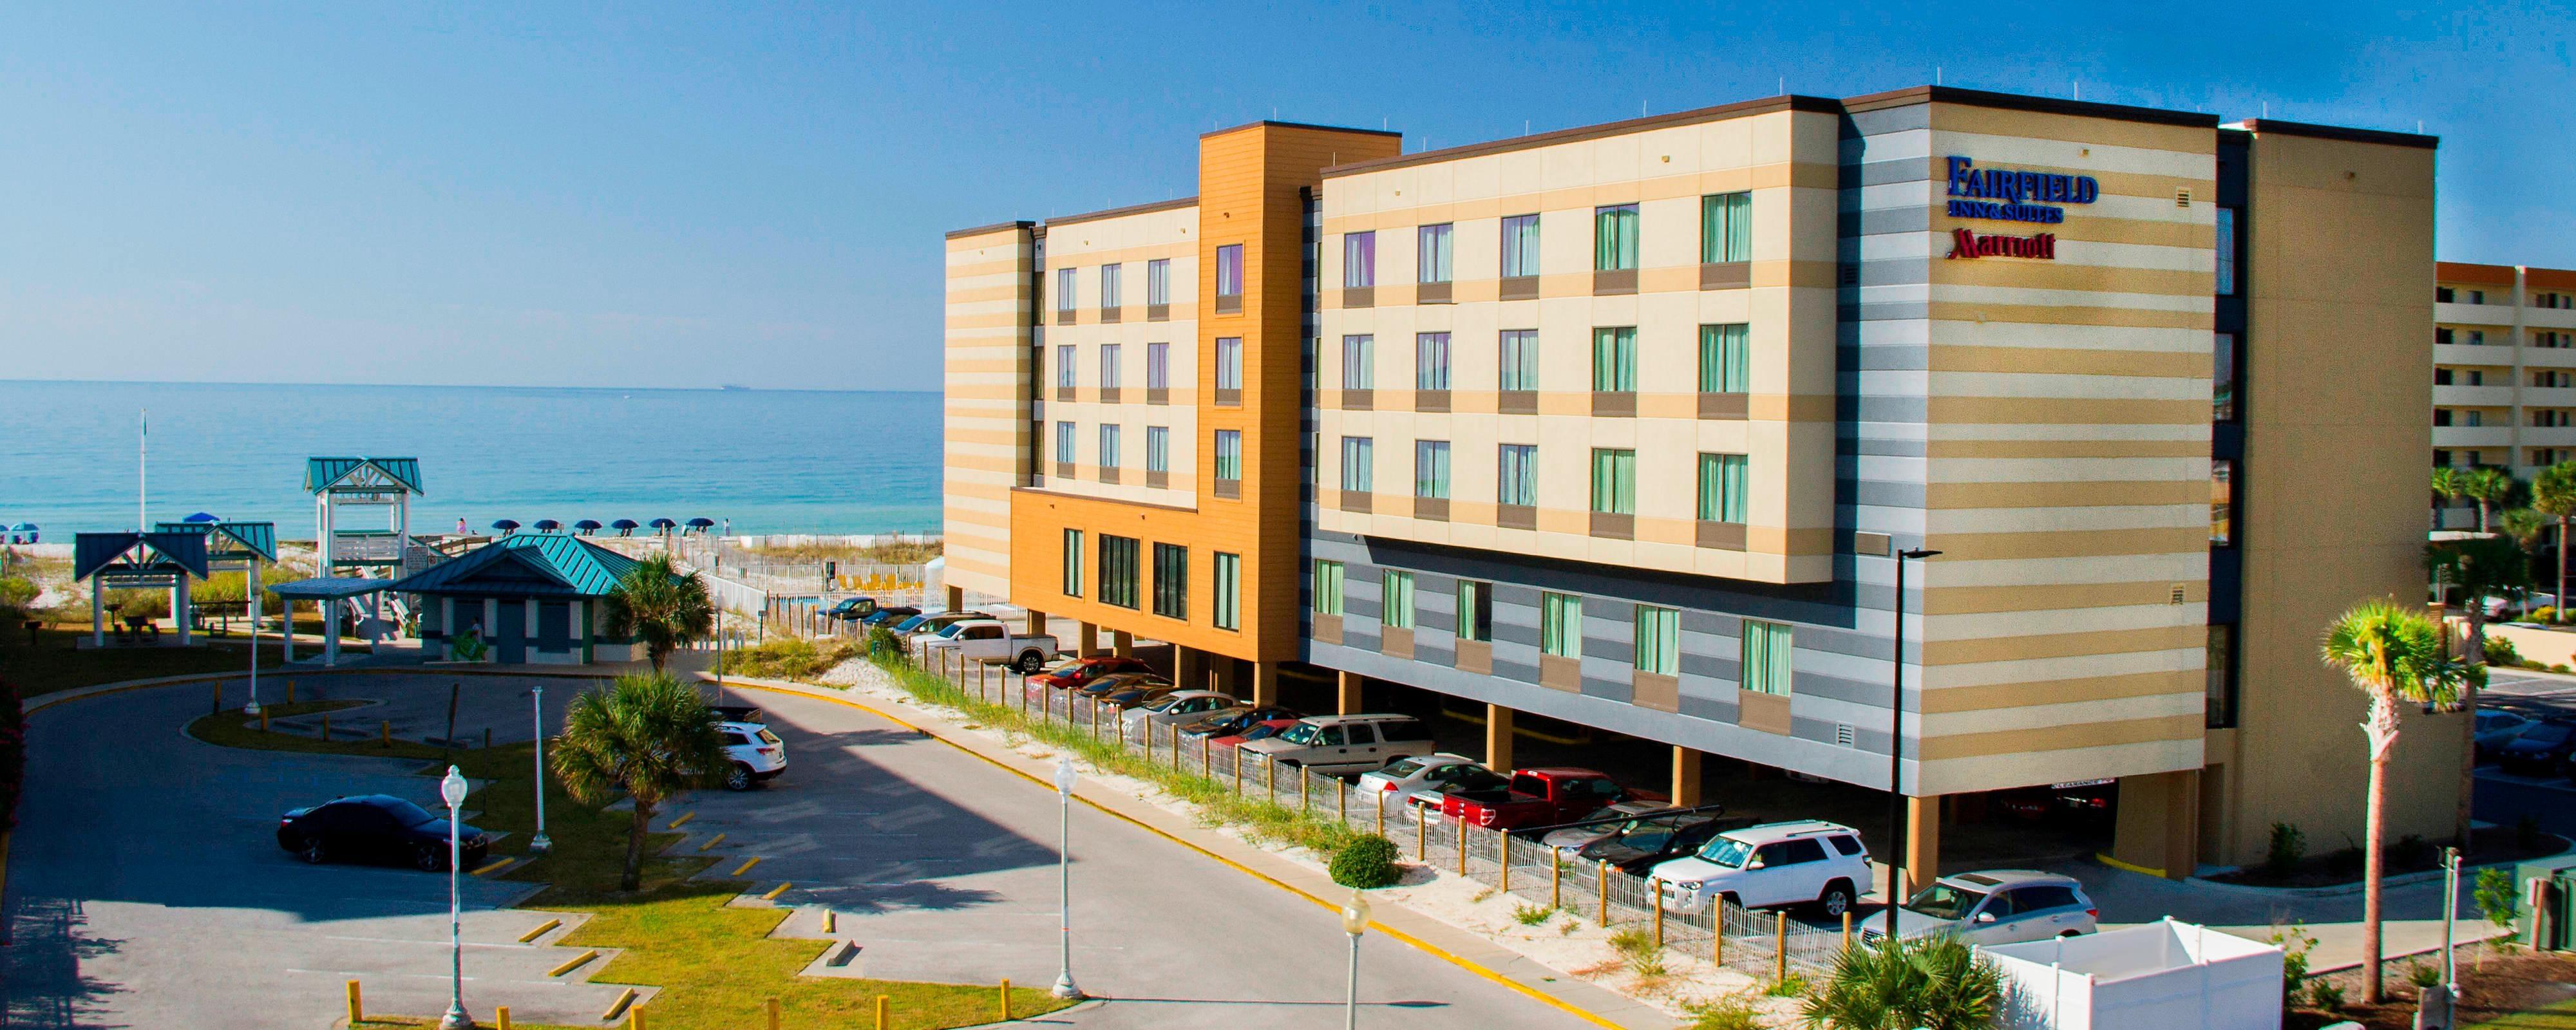 Hotel near VPS Airport | Fairfield Inn & Suites Fort Walton